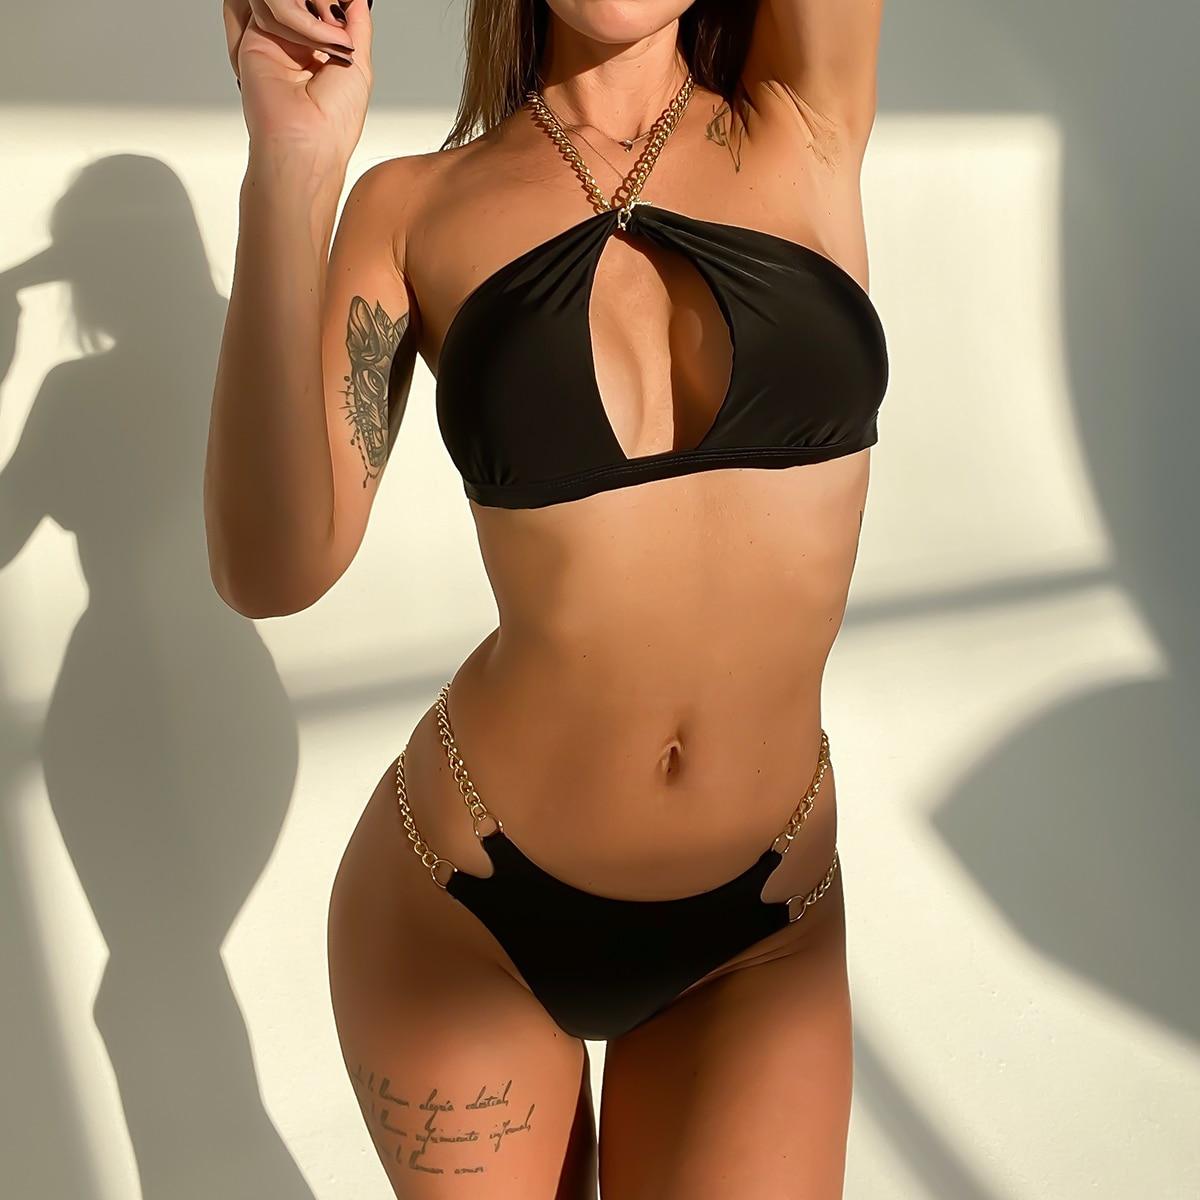 DJC313001-Women Sexy Bikini High Waist Swimsuit